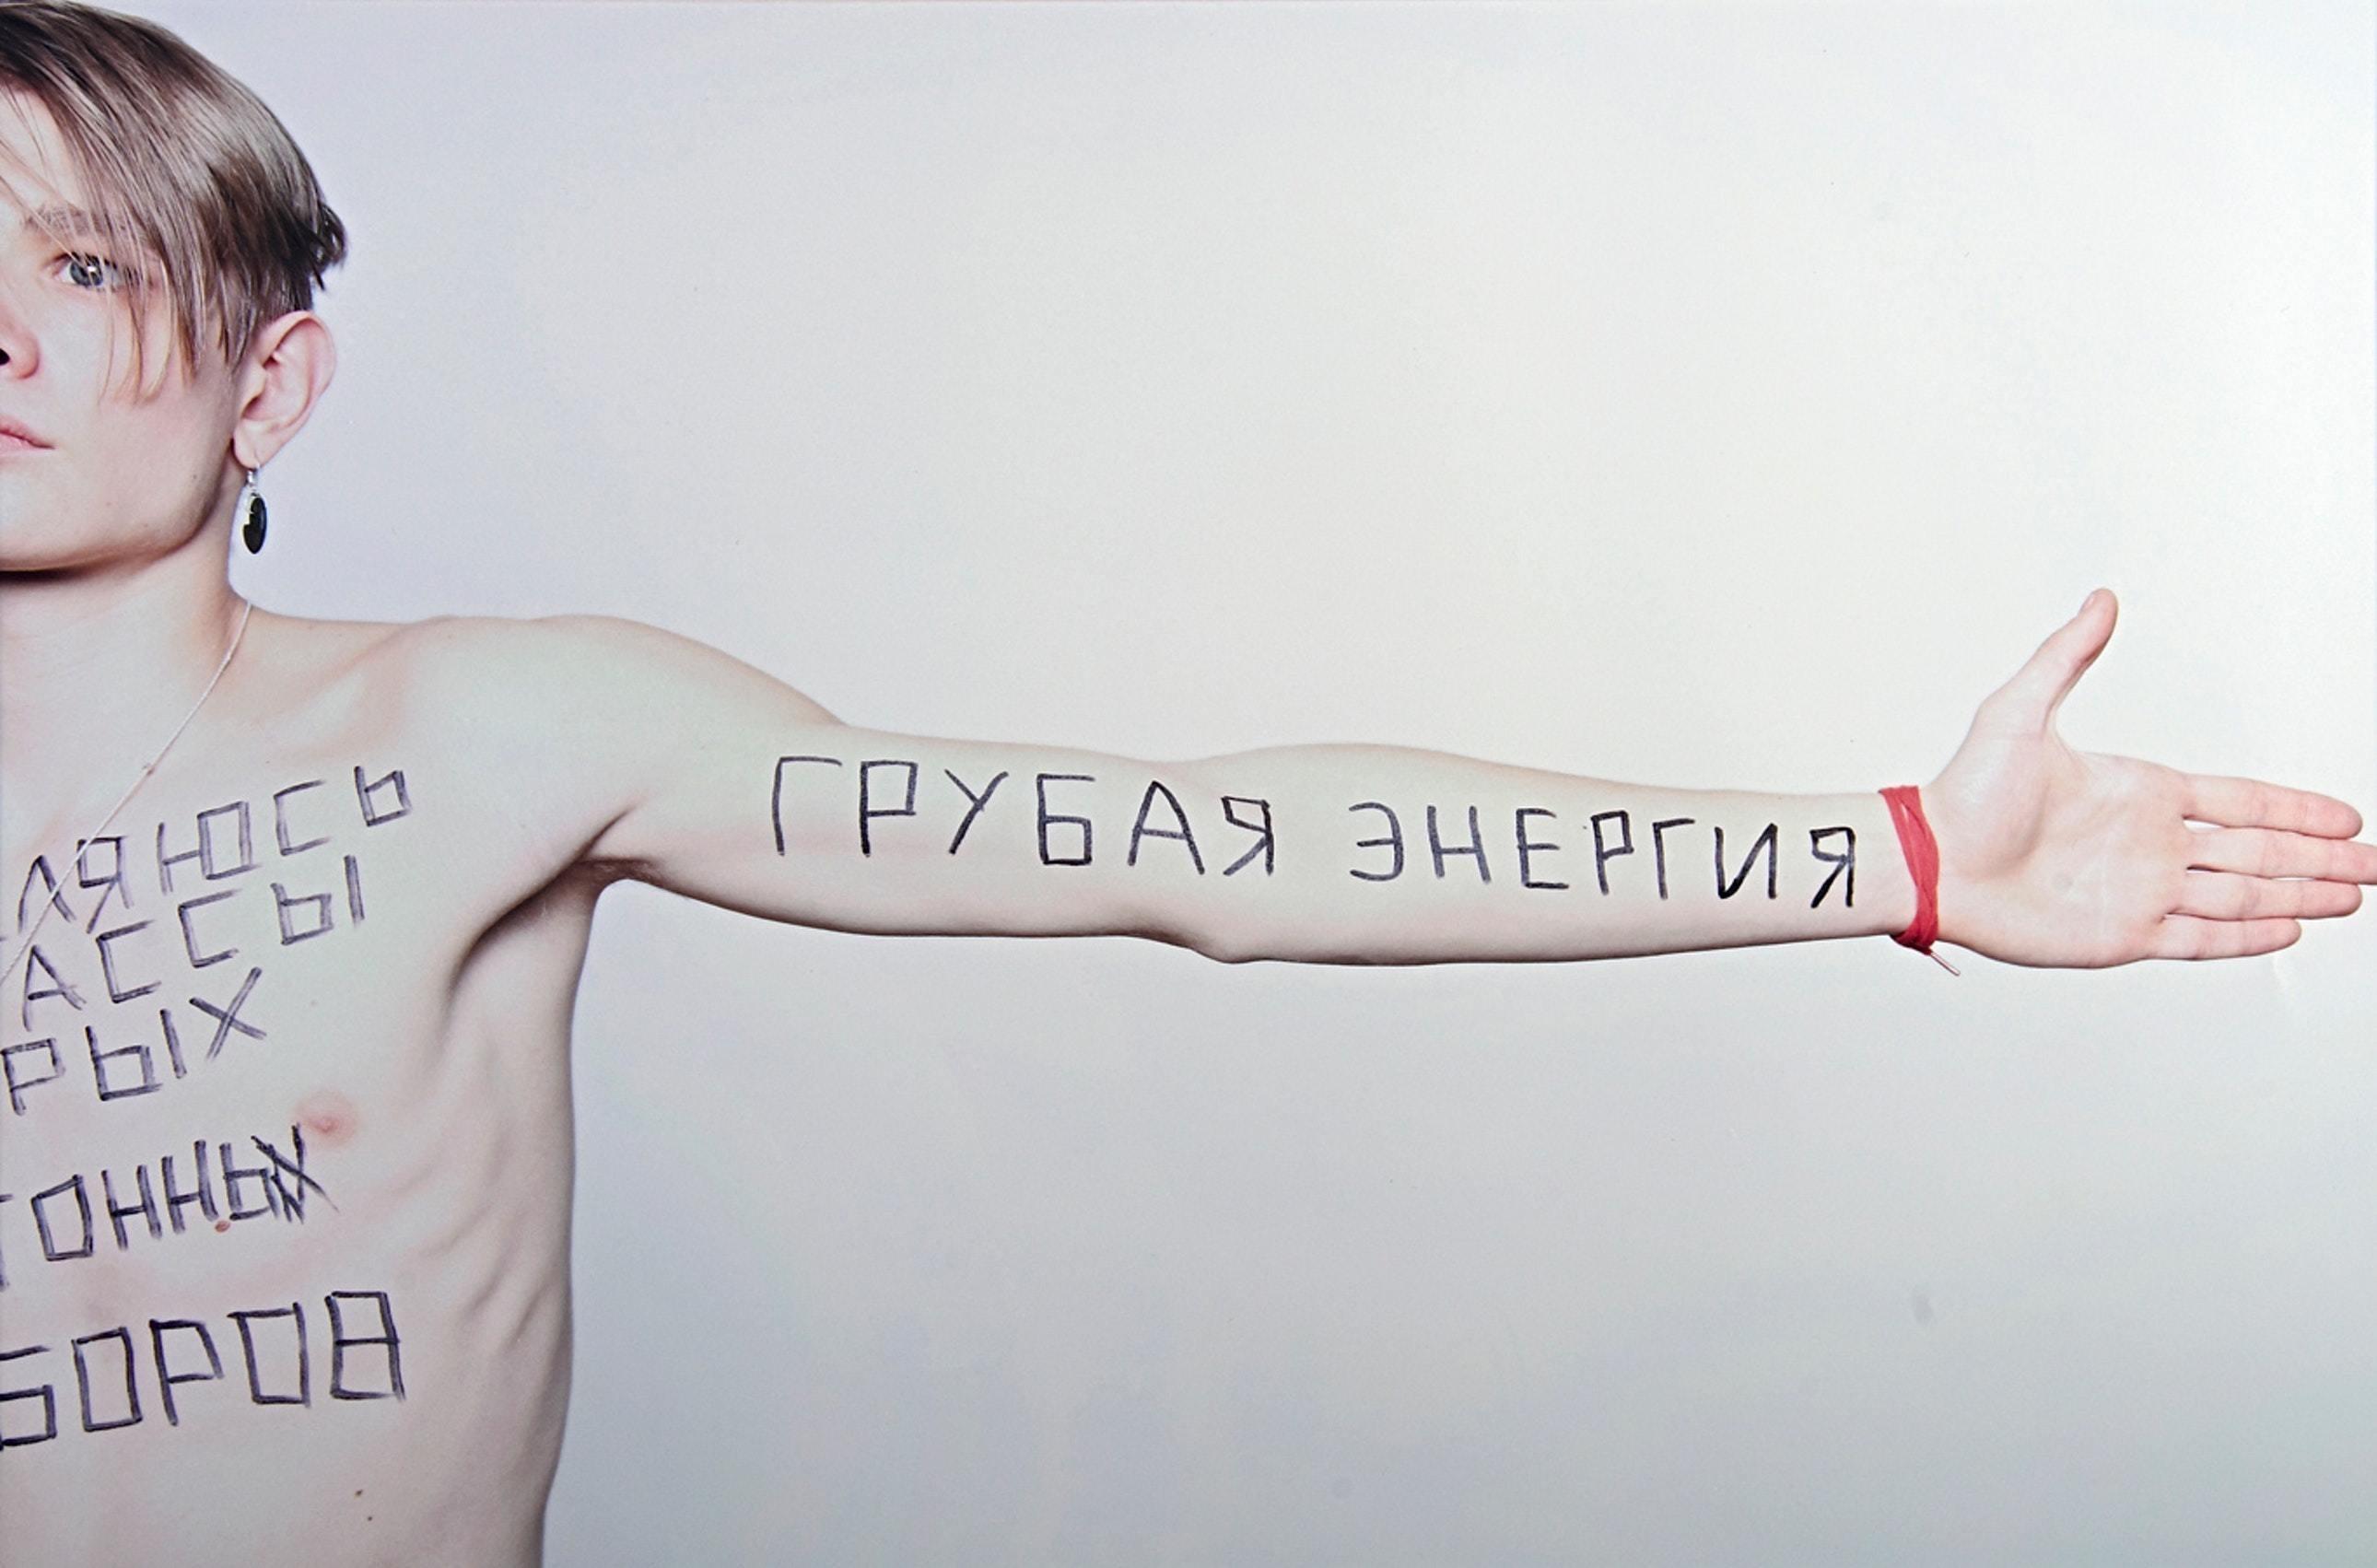 Фото: Алина Гуткина